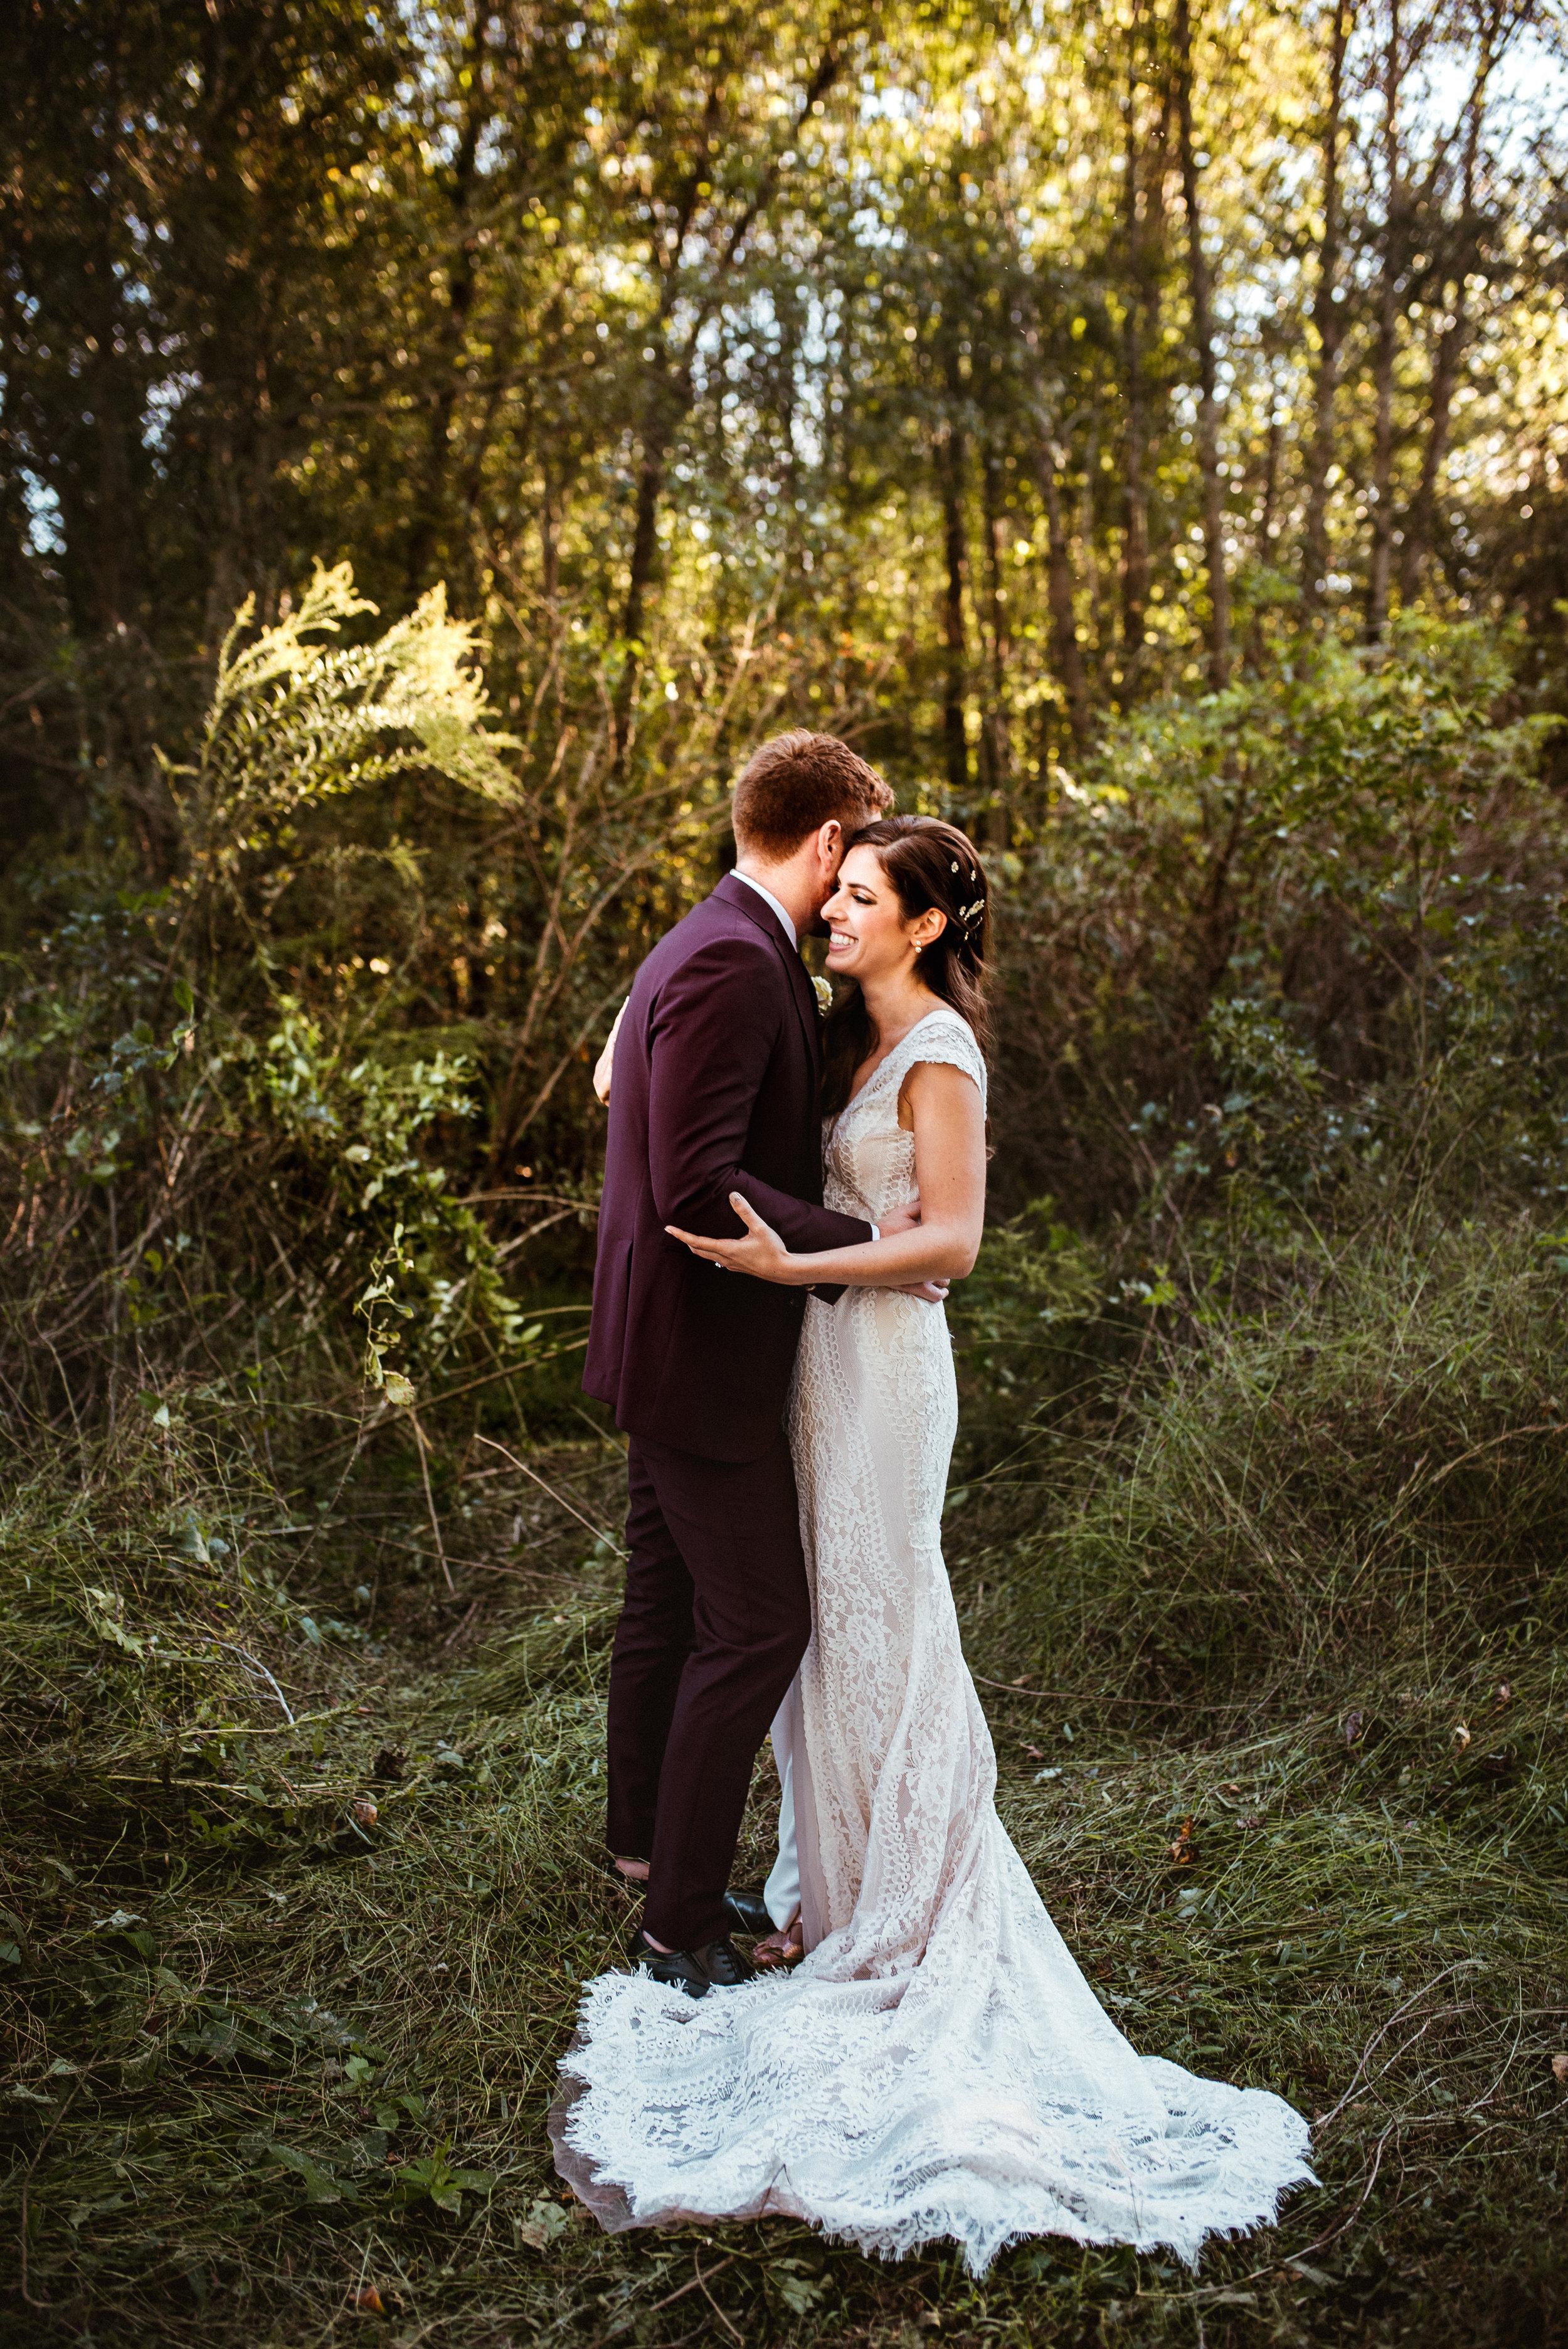 Rougemont wedding - sassafras fork farm - sassafras fork farm wedding - rougemont wedding - rougemont wedding photographer